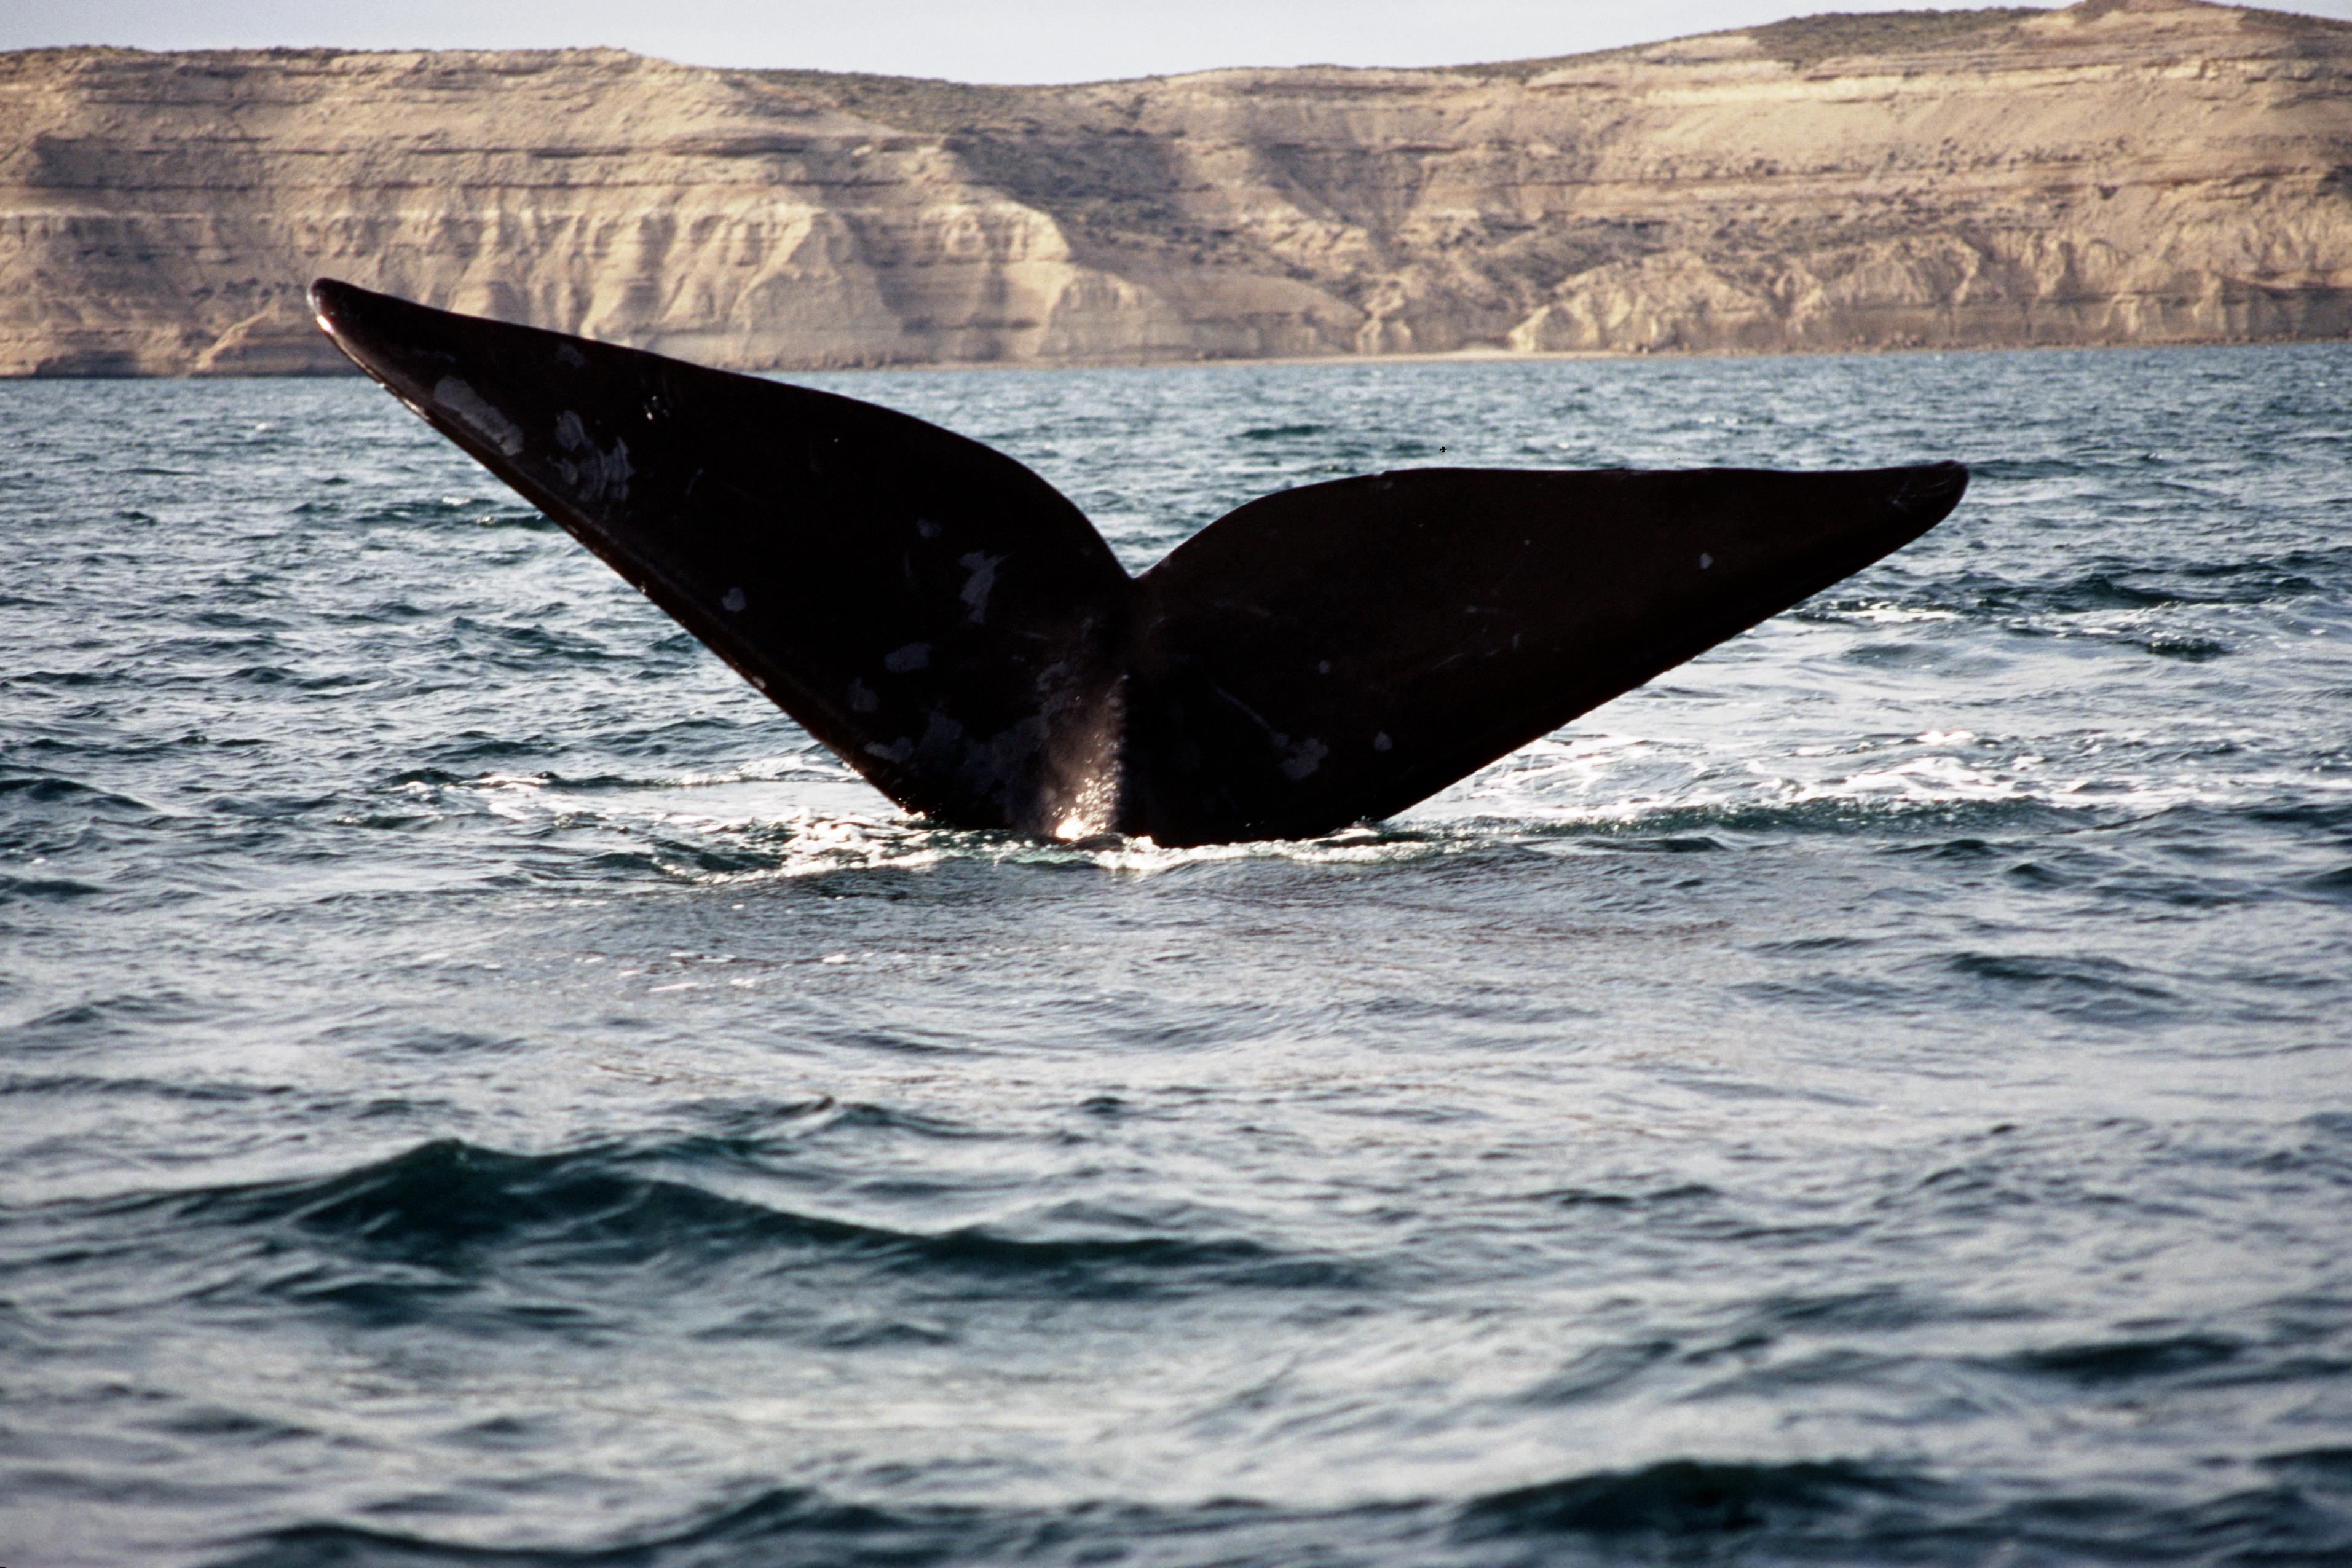 Whale - Peninsula Valdes - ARGENTINA. Flickr - Mazali.